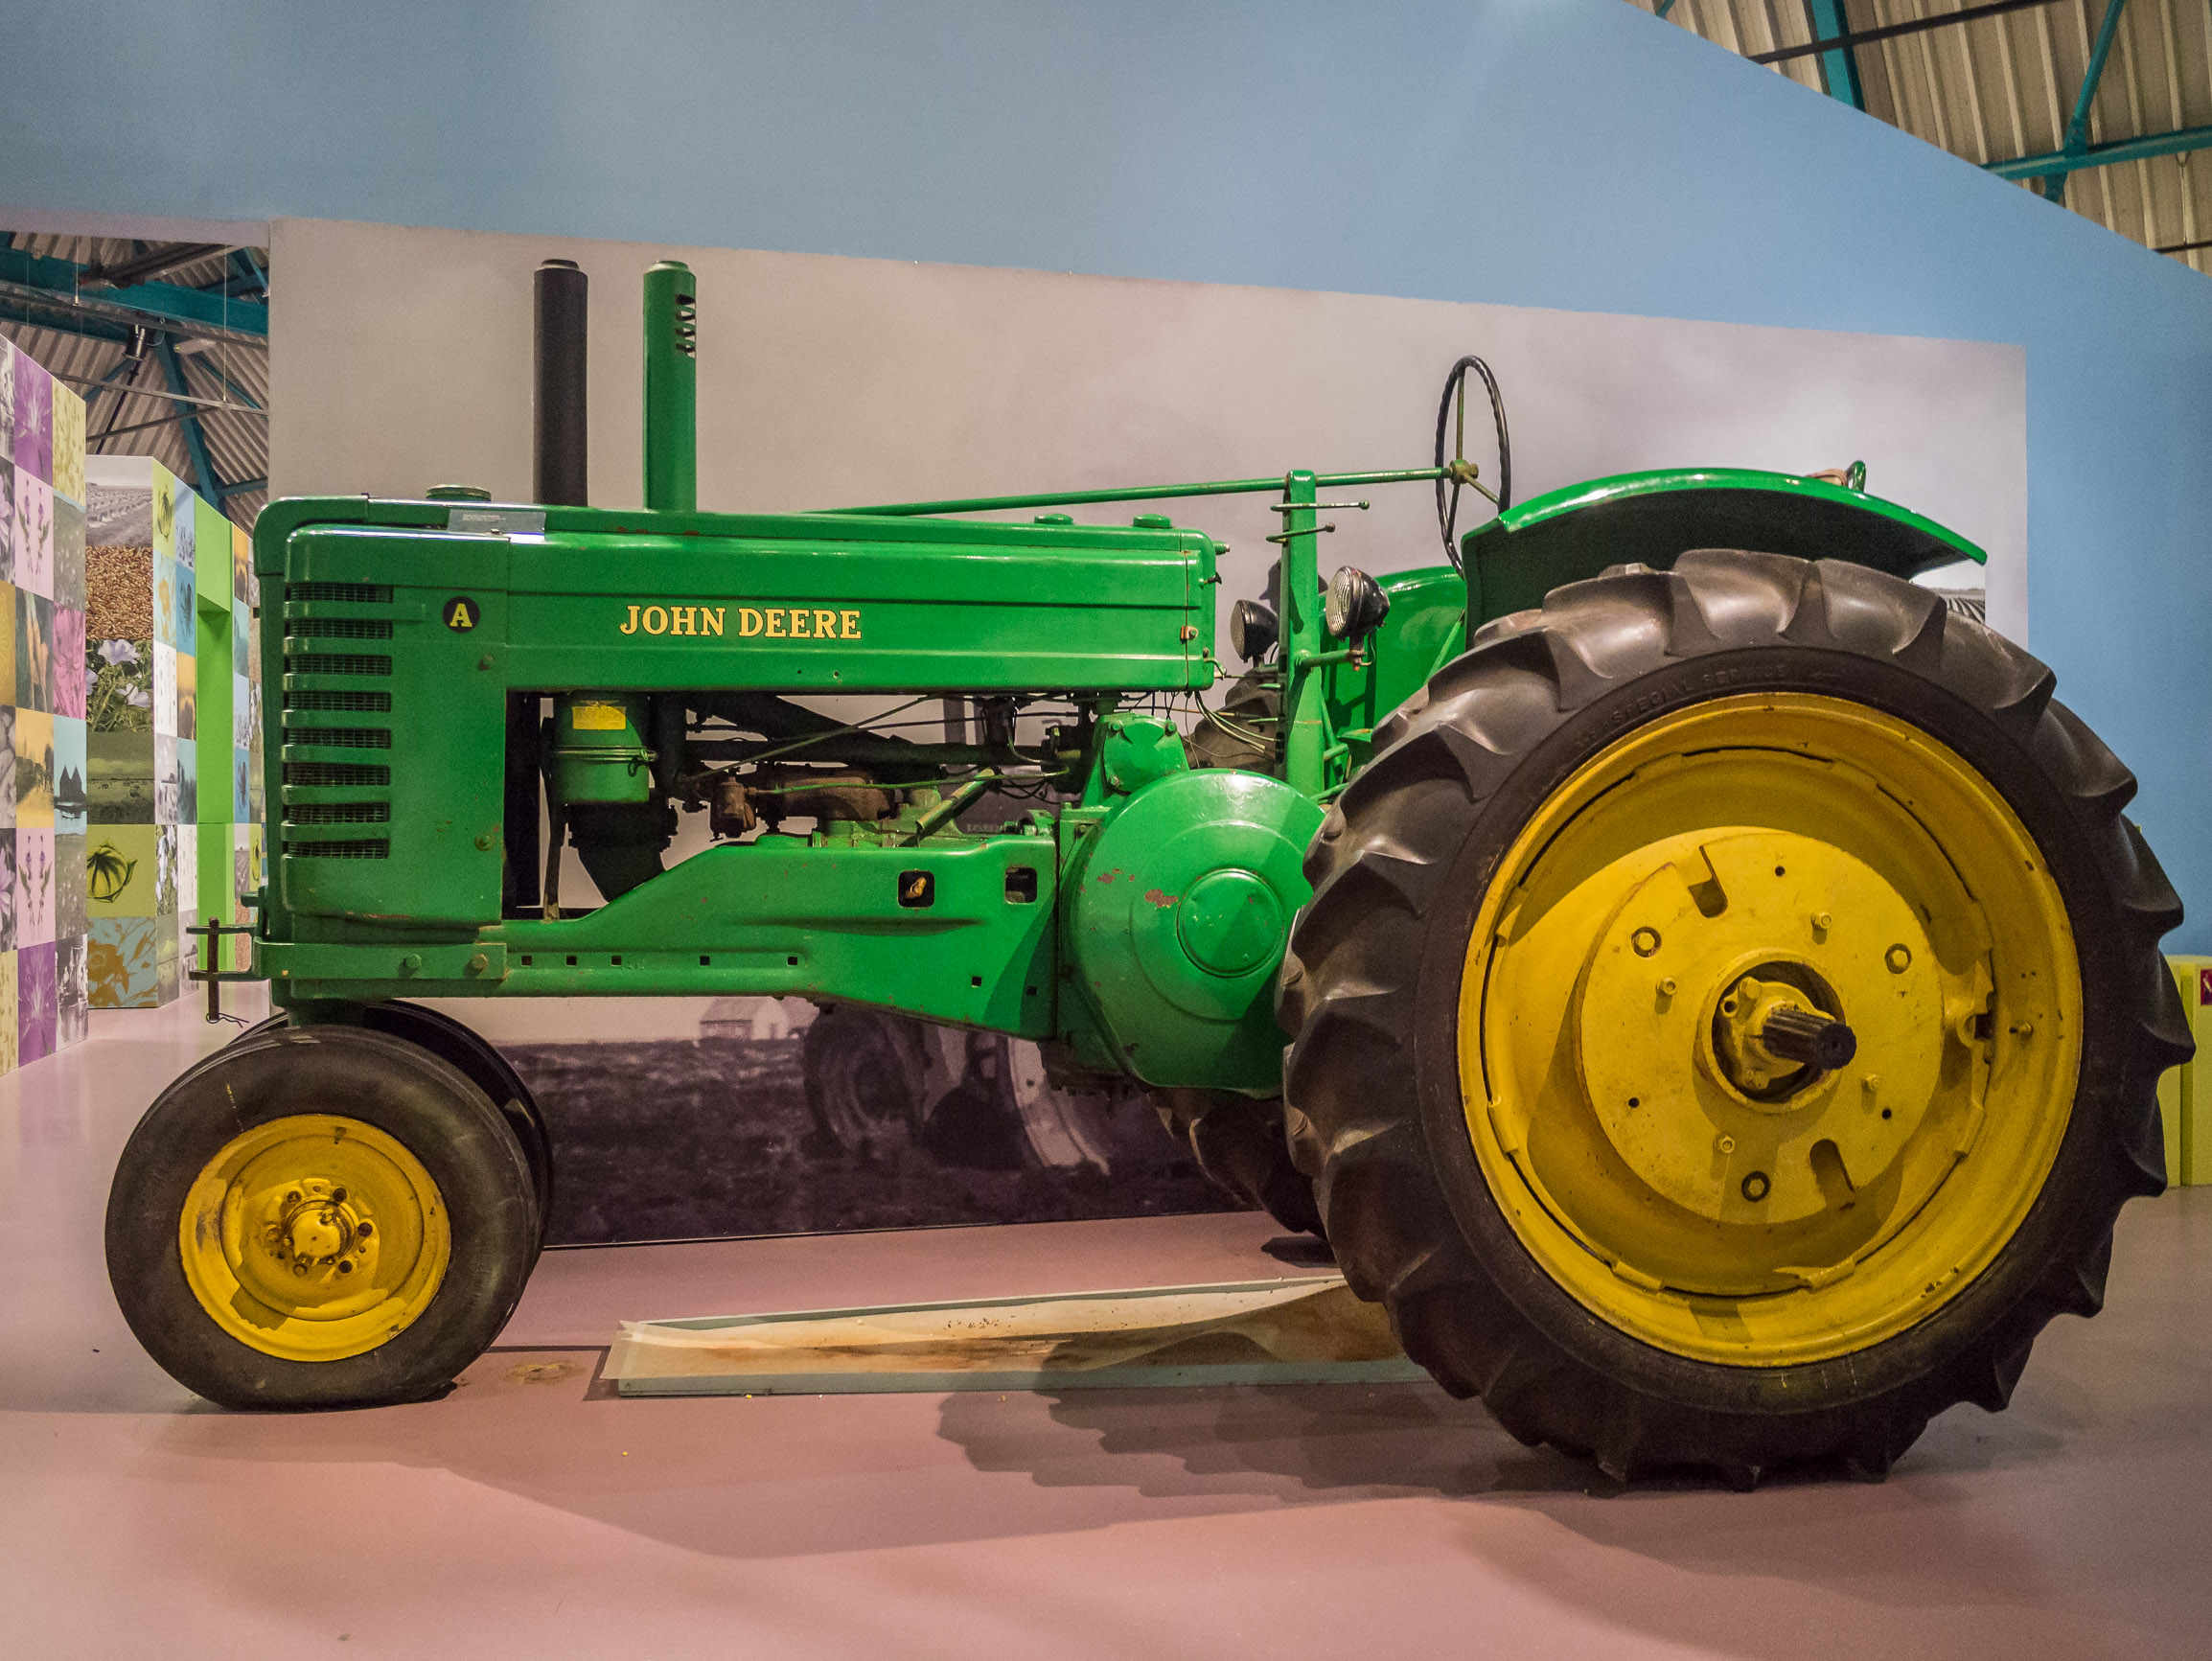 FileFries Landbouwmuseum Earnewld  John Deere trekkerjpg